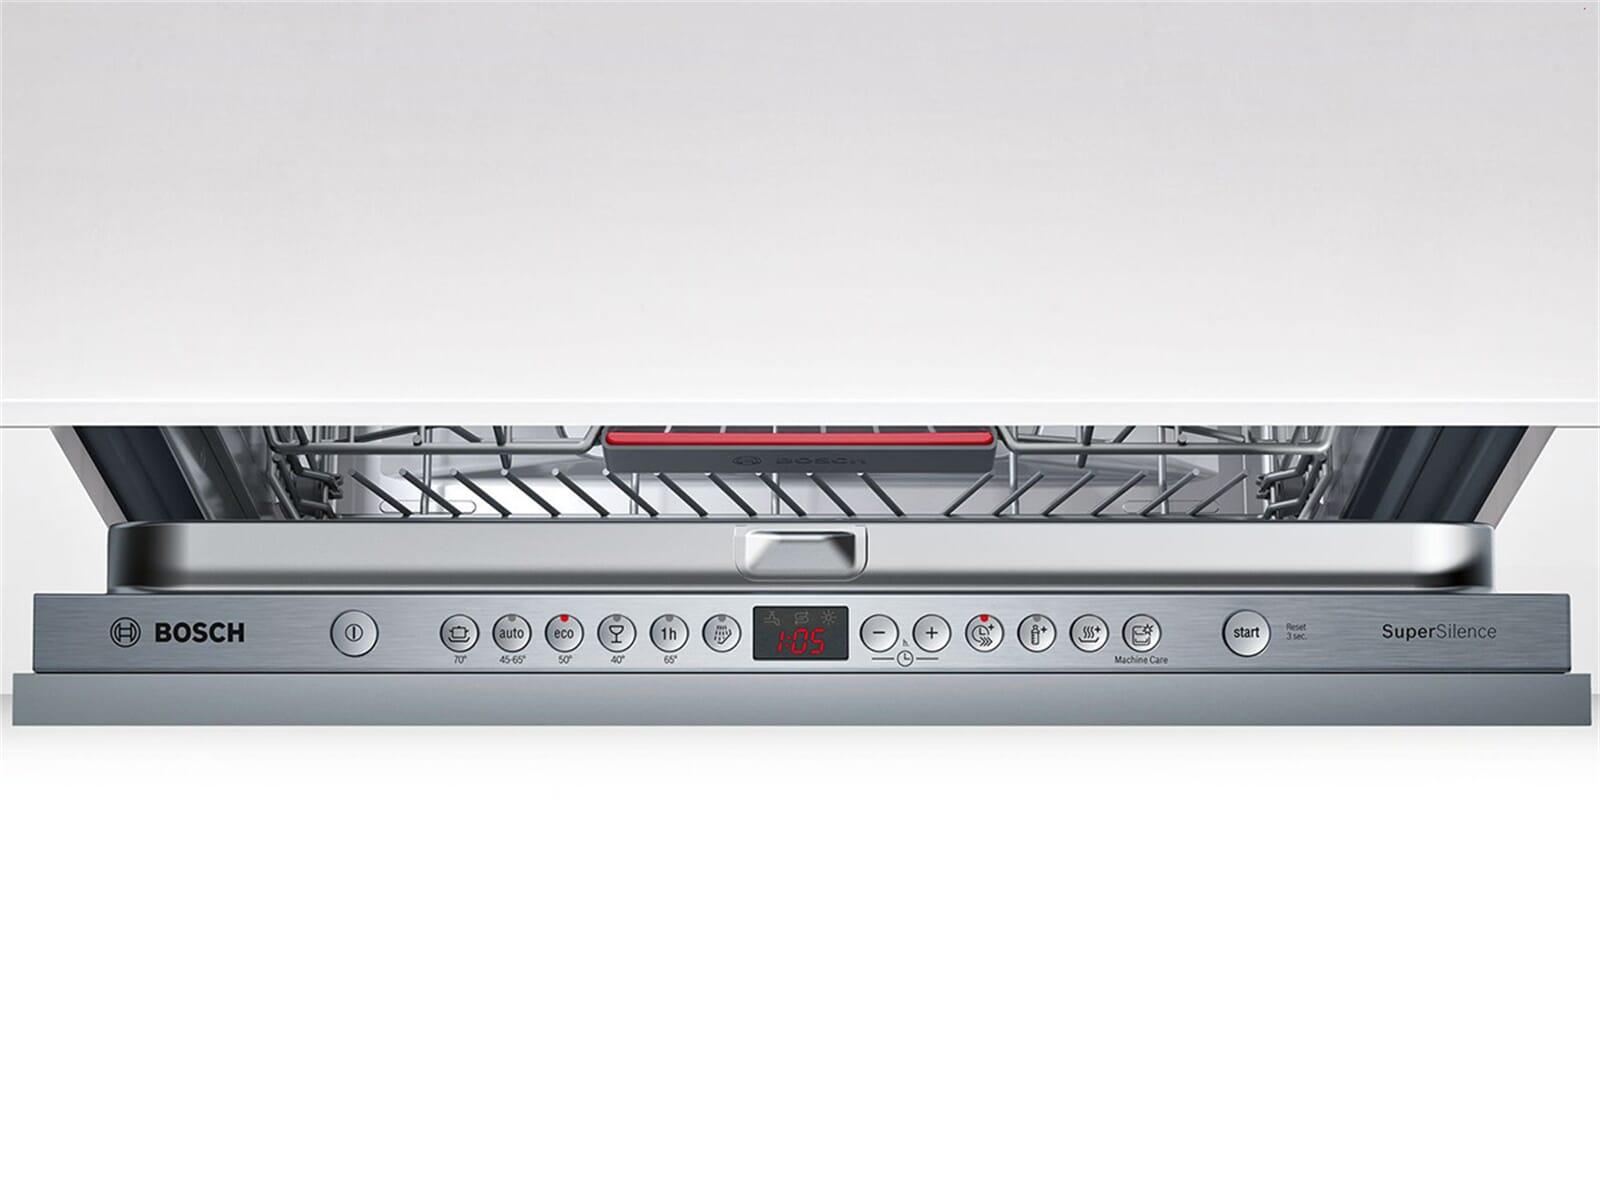 Bosch Kühlschrank Bedienungsanleitung : Bosch sme46mx03e vollintegrierbarer einbaugeschirrspüler